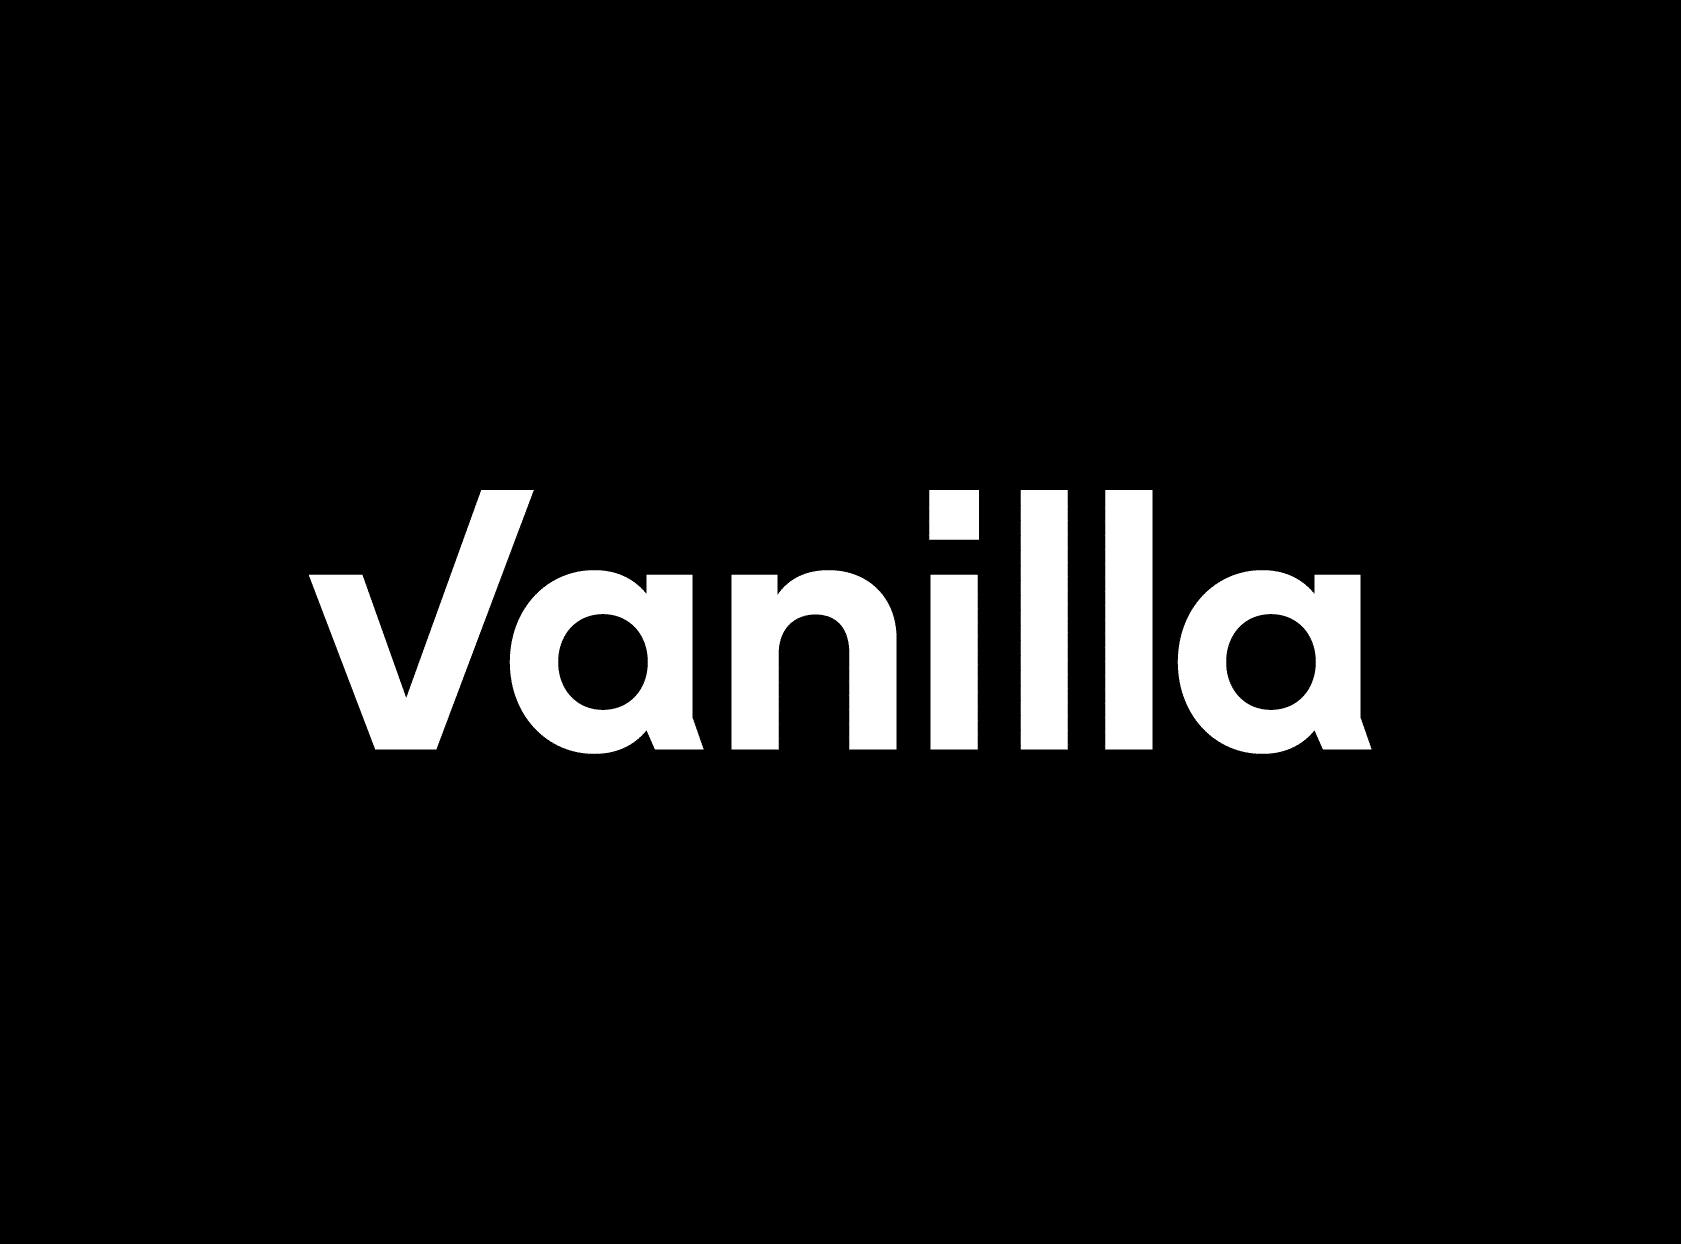 Identity for Vanilla